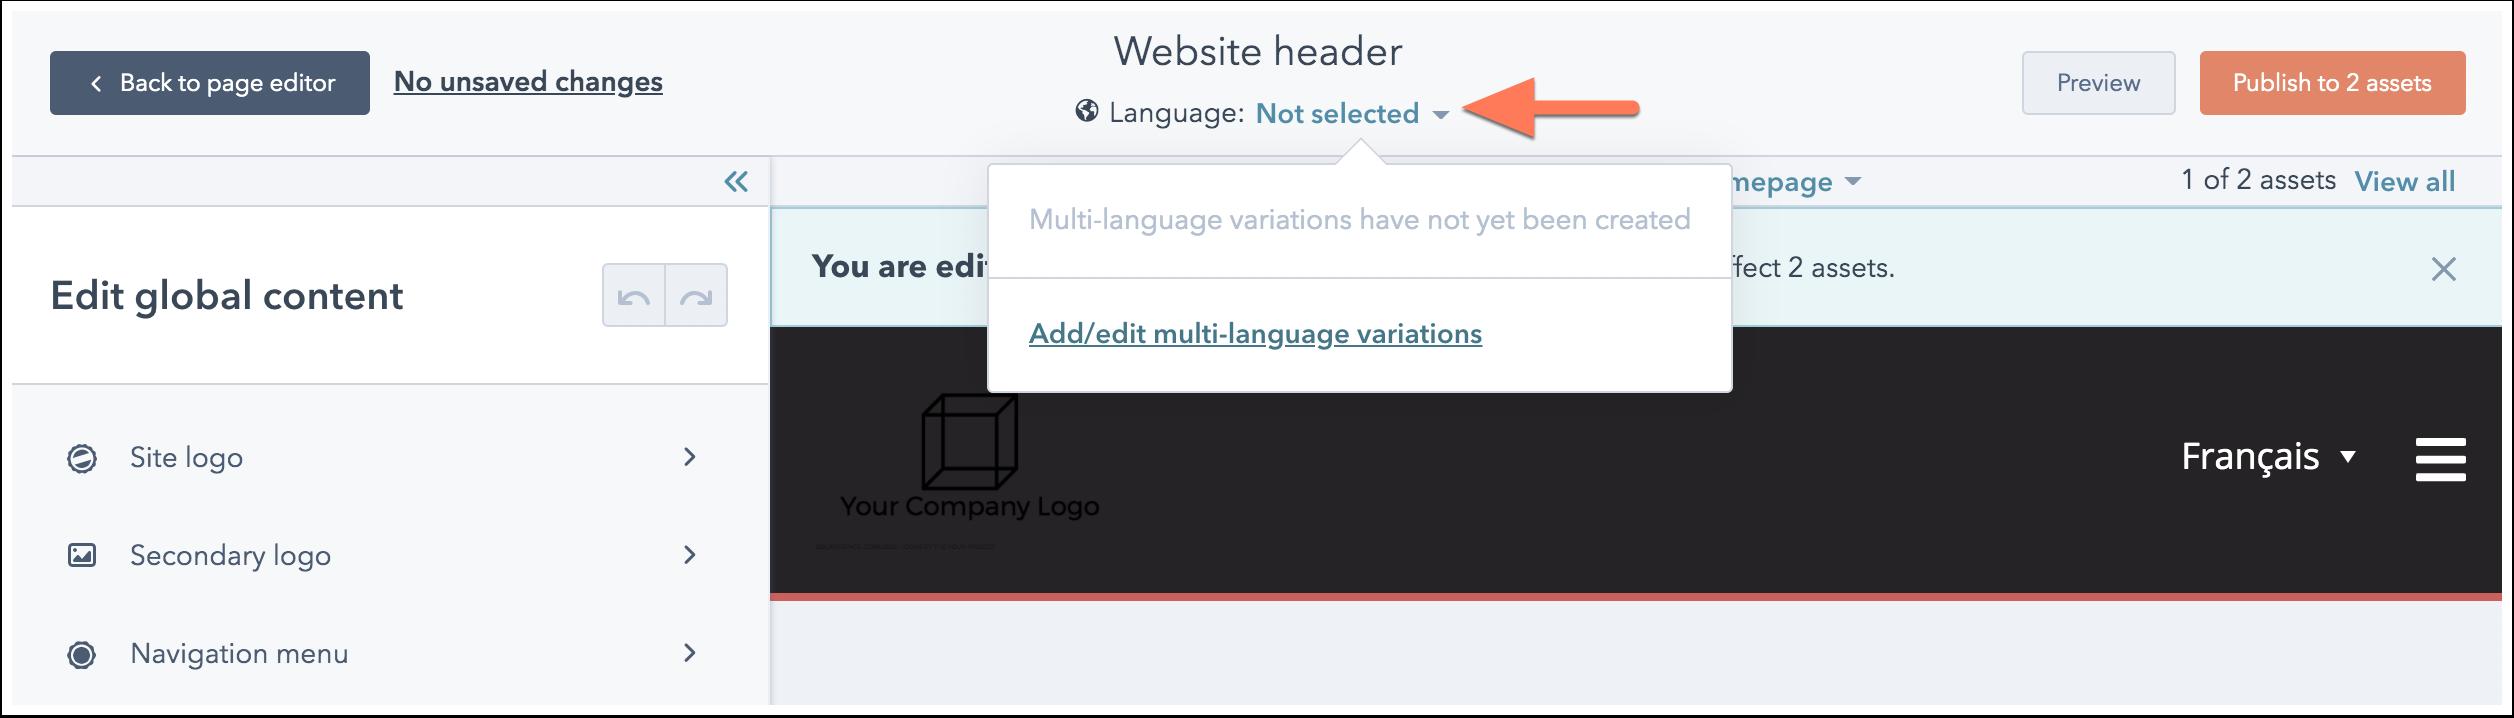 edit-multilanguage-global-content